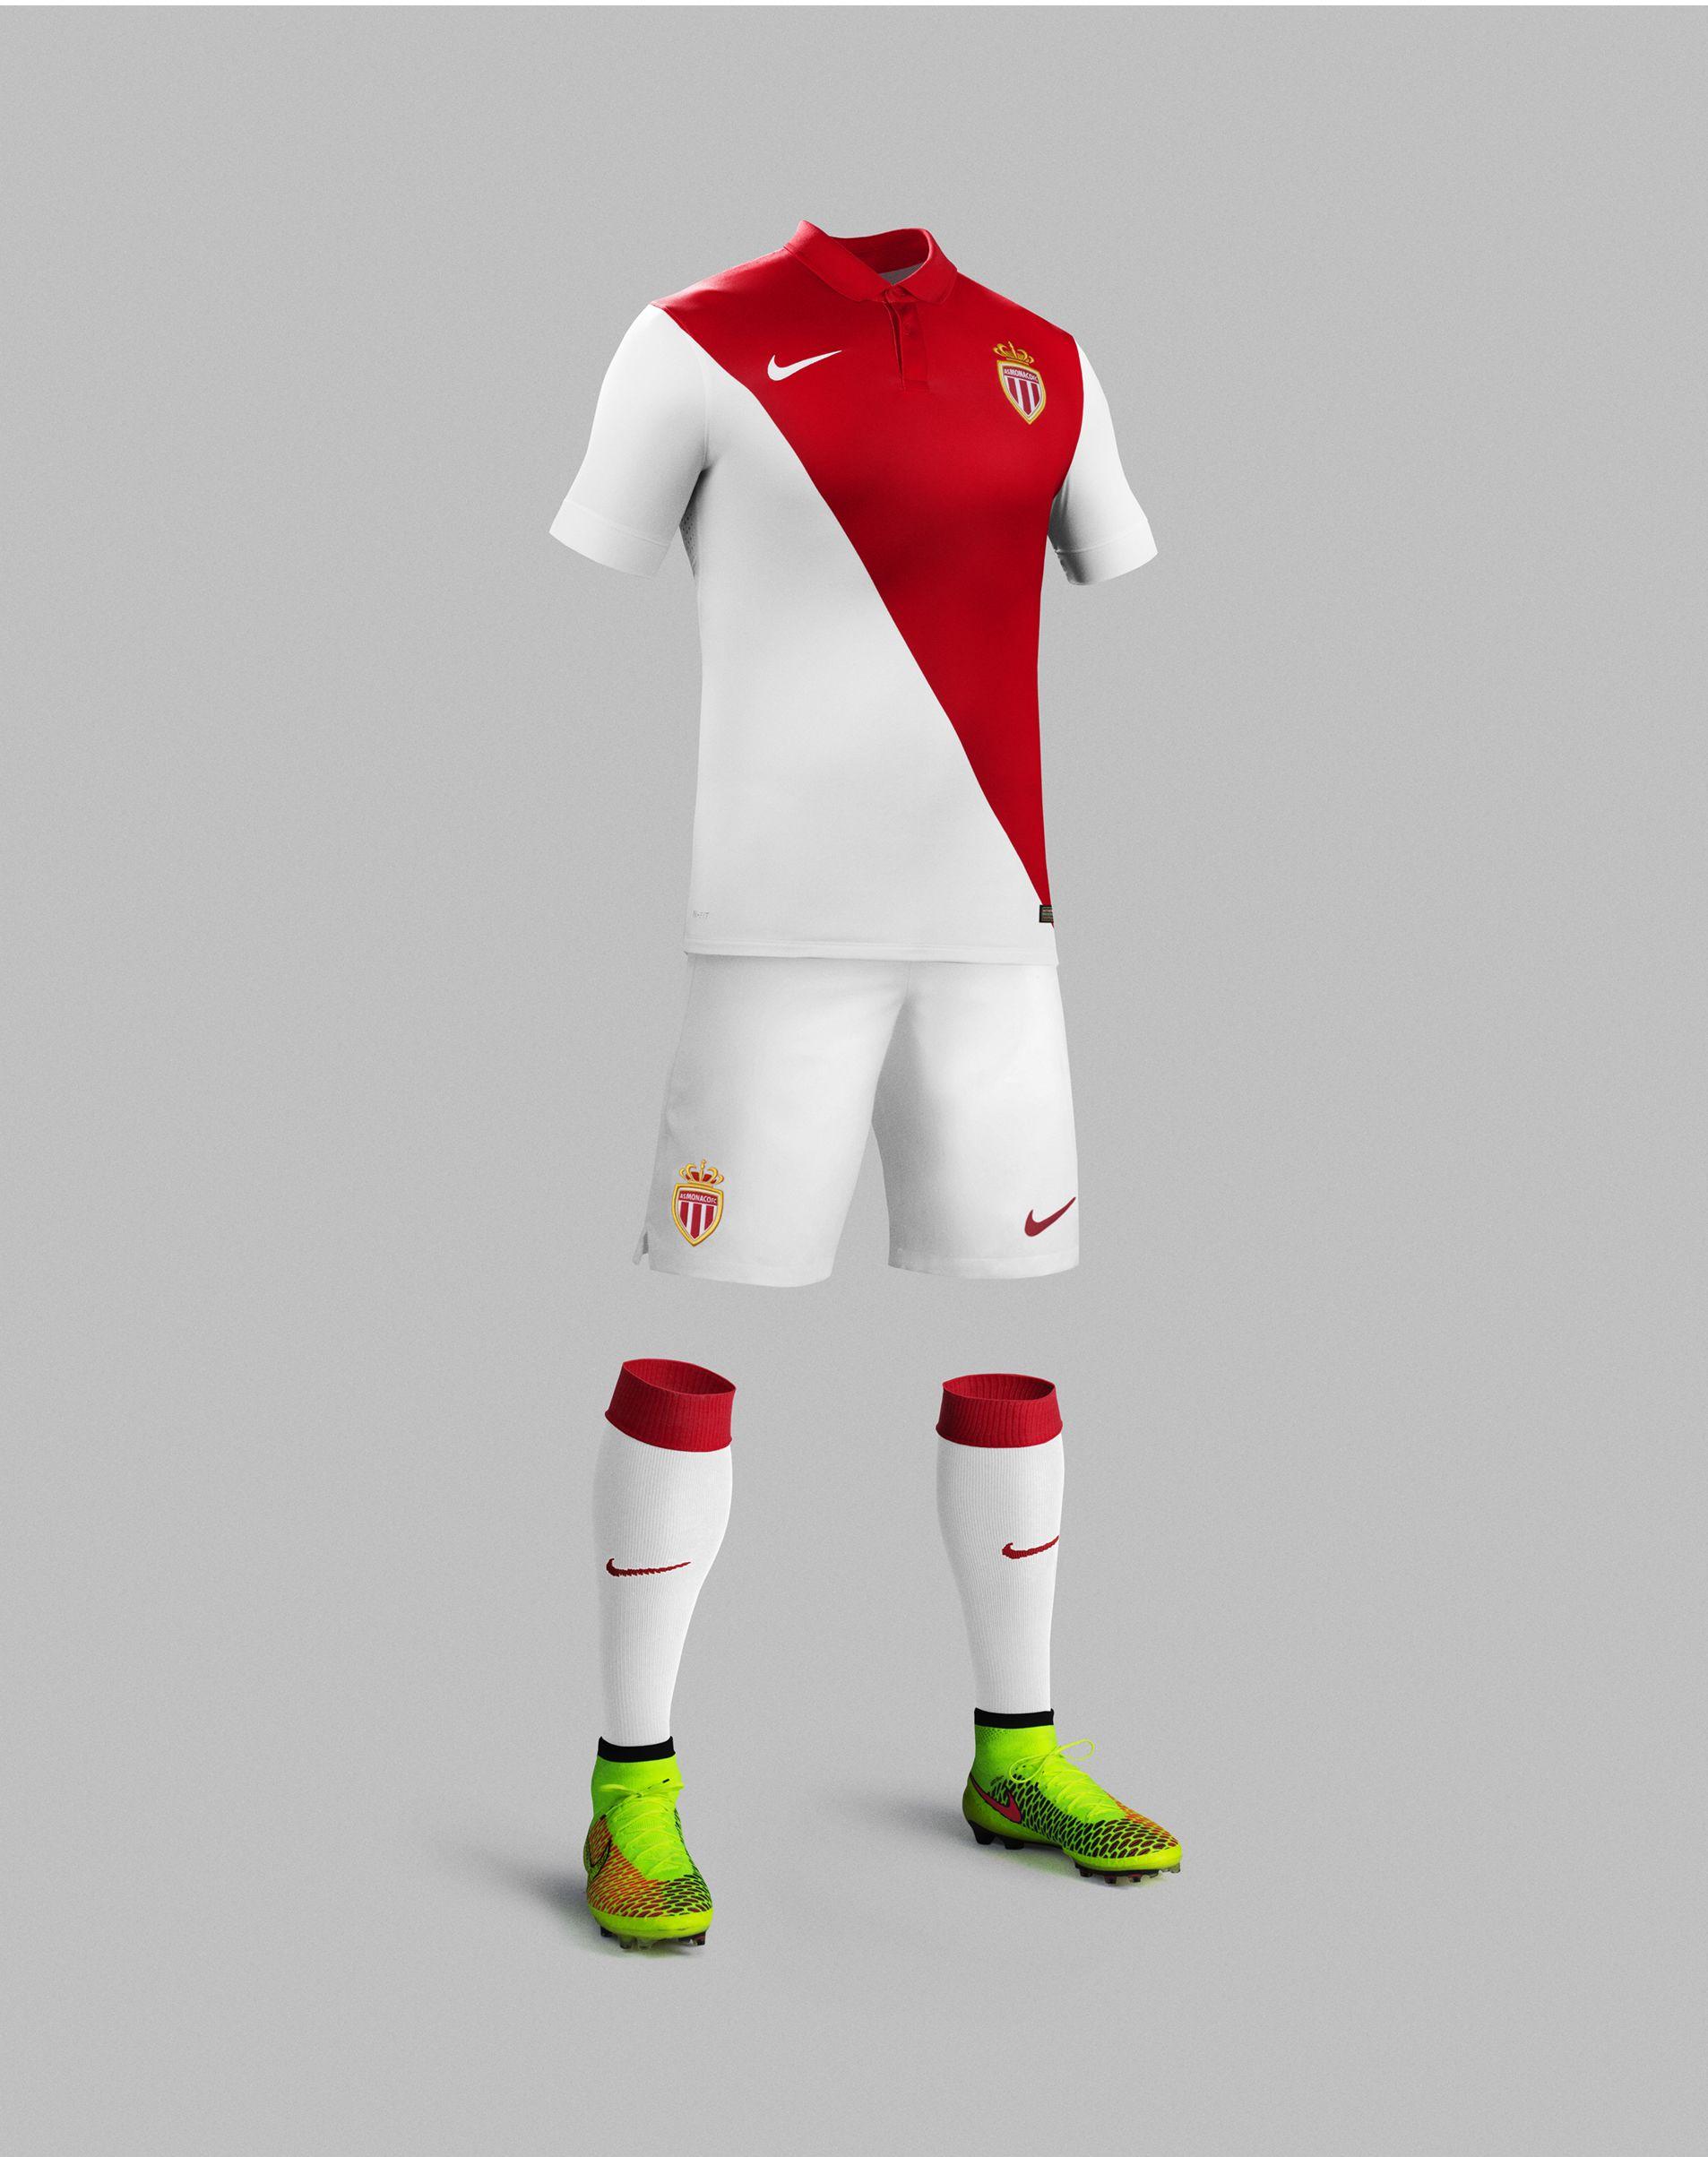 uniforme barcelona 2015 alternativo - Buscar con Google  f6a38d0877f49